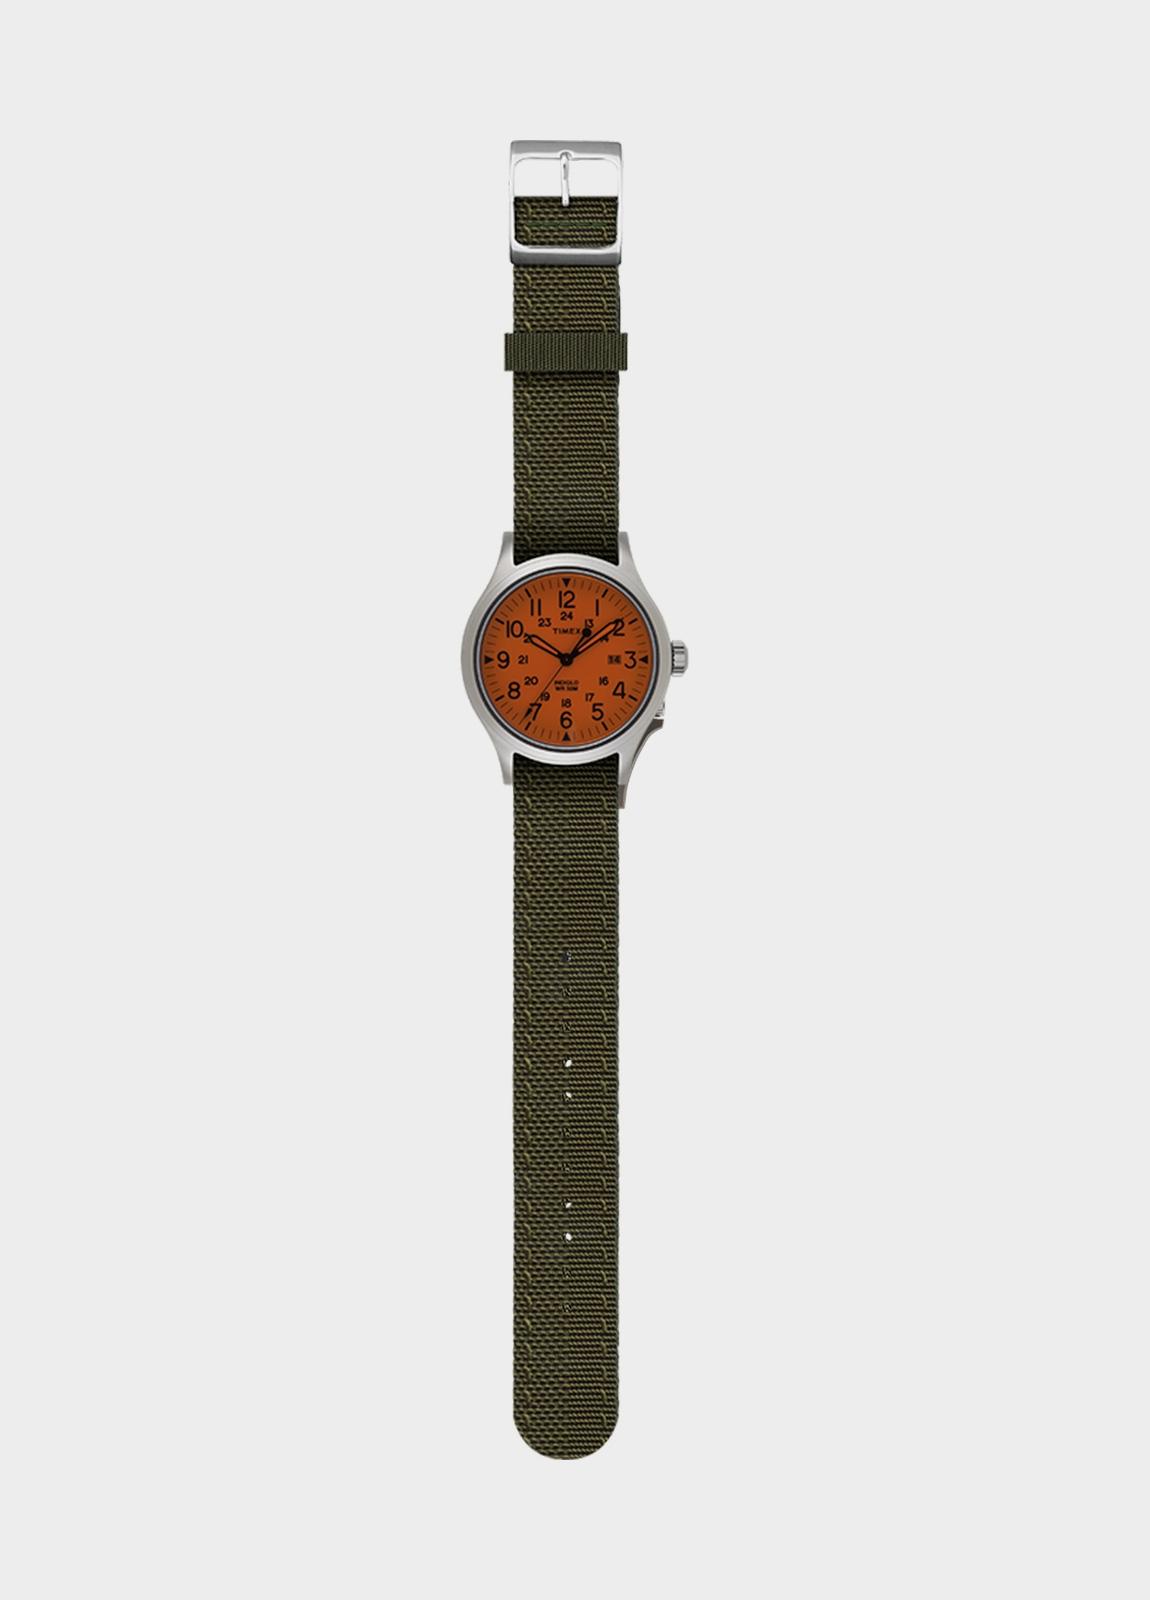 Correa Reloj TIMEX reversible naranja/ kaki (la caja reloj se vende por separado) - Ítem1